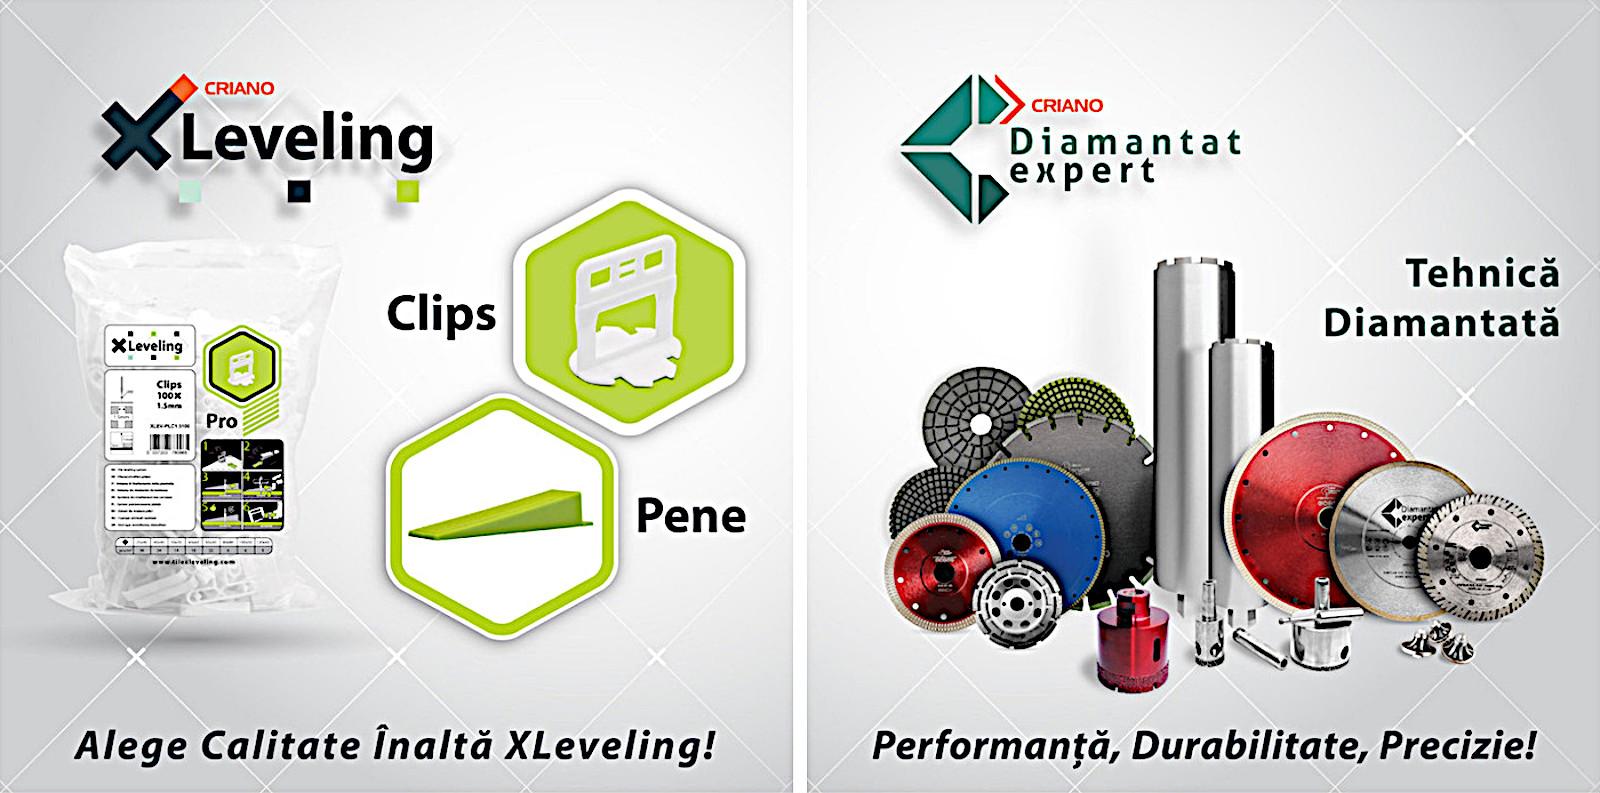 XLeveling Diamantat expert